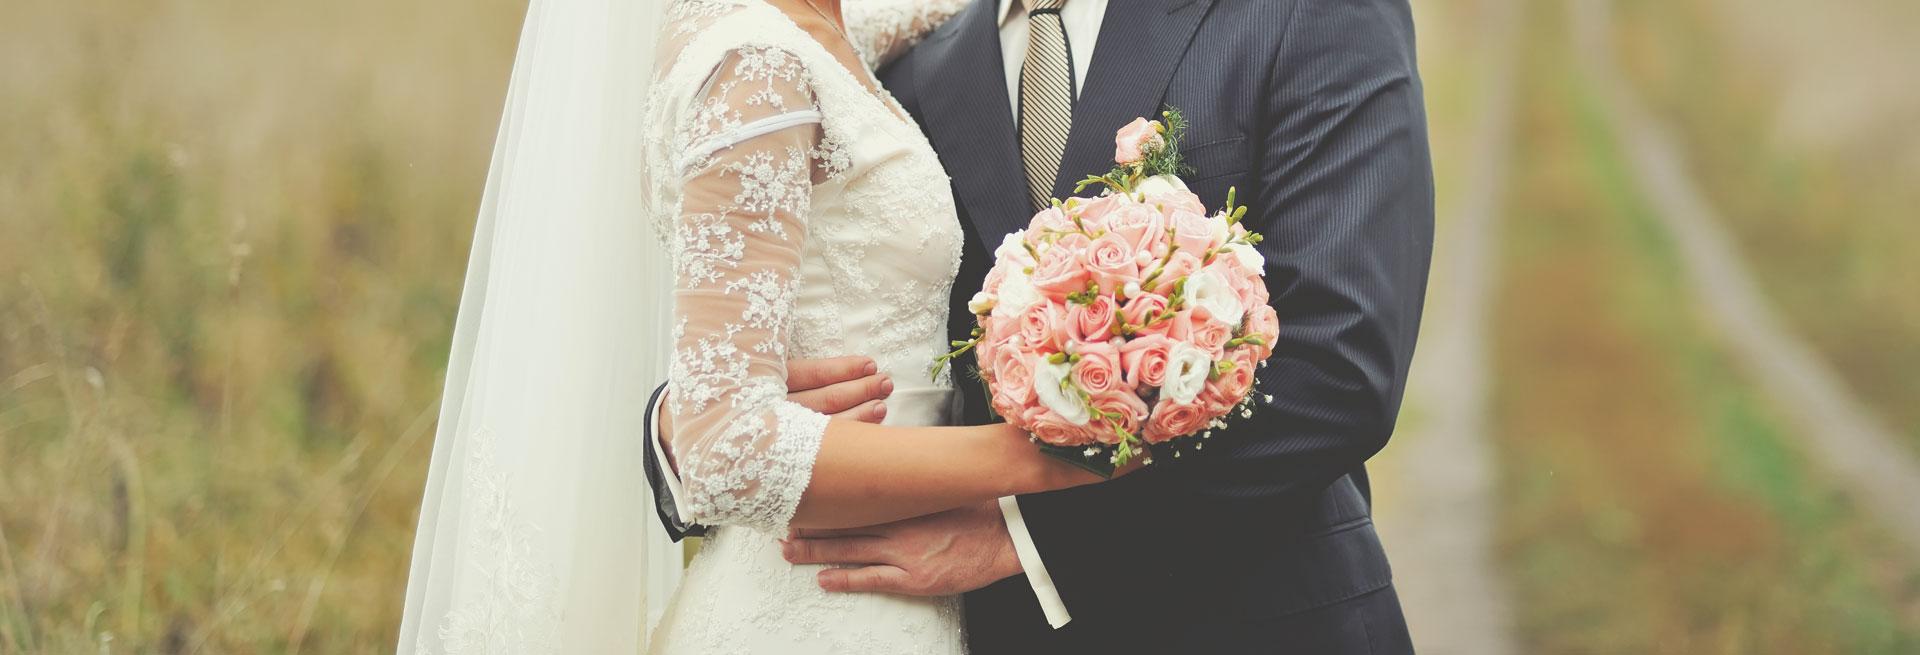 mariage-sur-mesure-mont-vernon